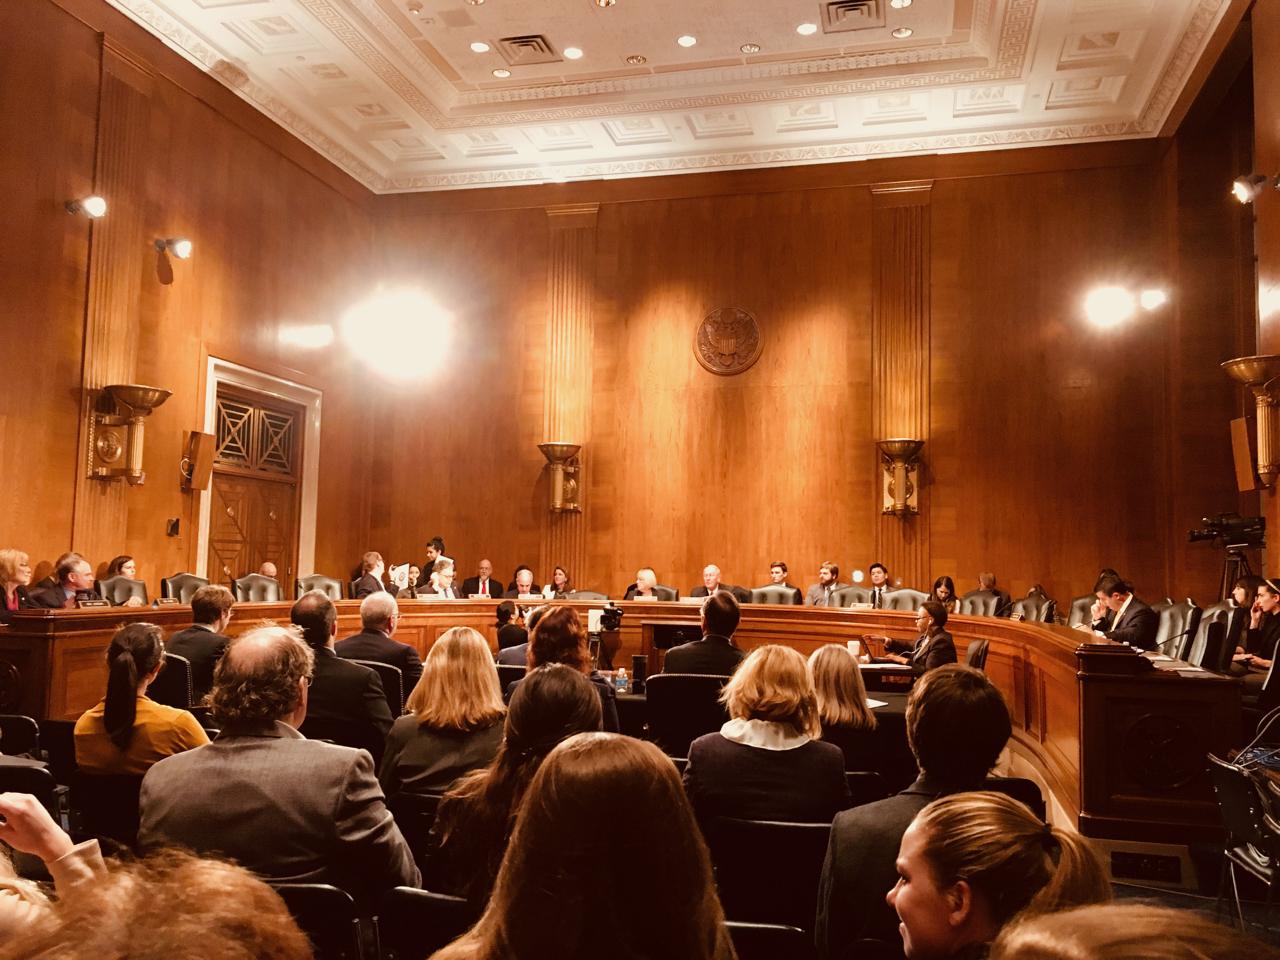 Senate Committee hearing